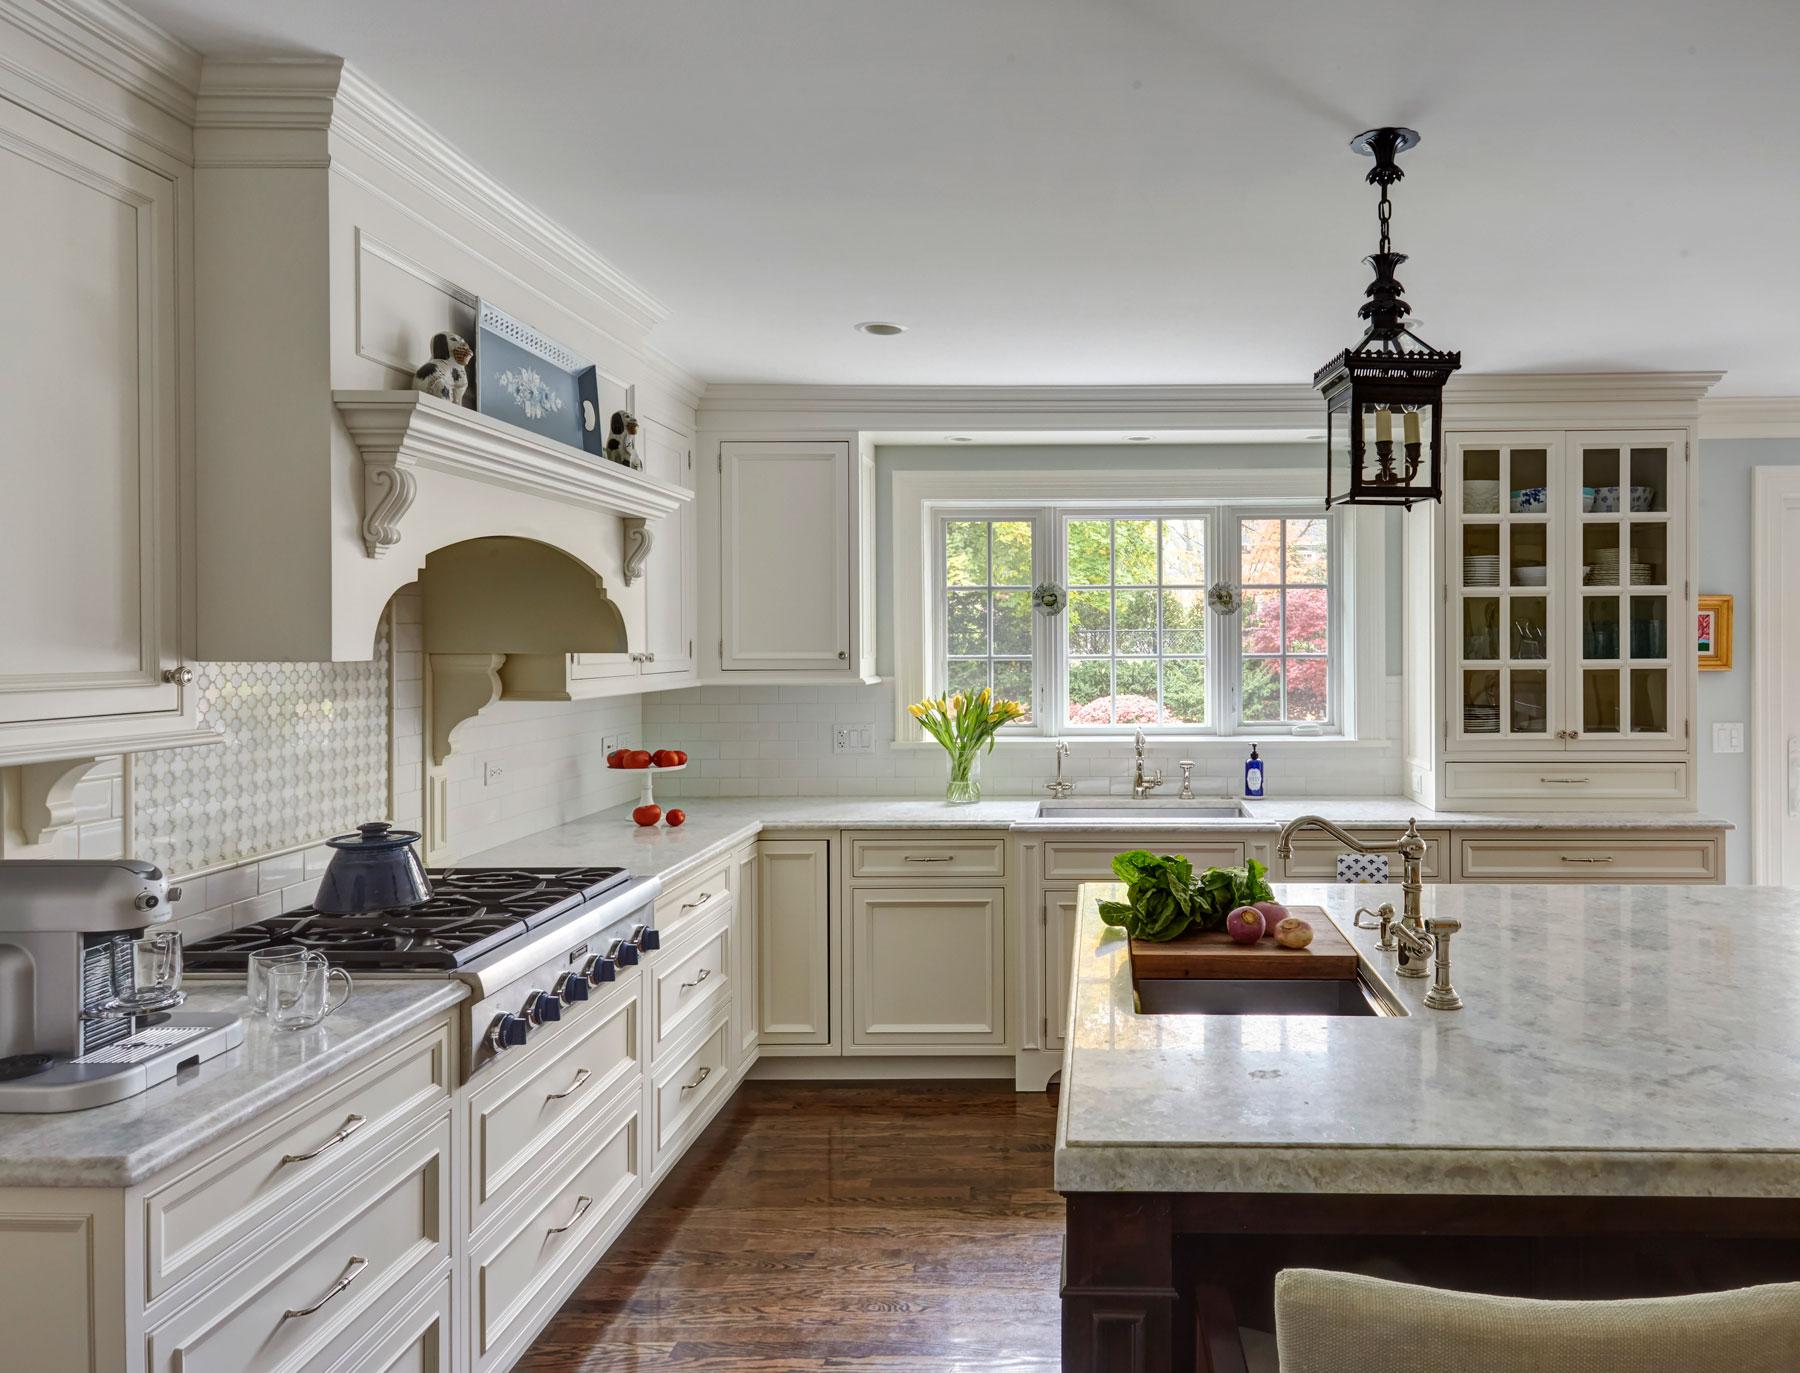 DK&B Designer Kitchens & Baths Inc Deerfield IL